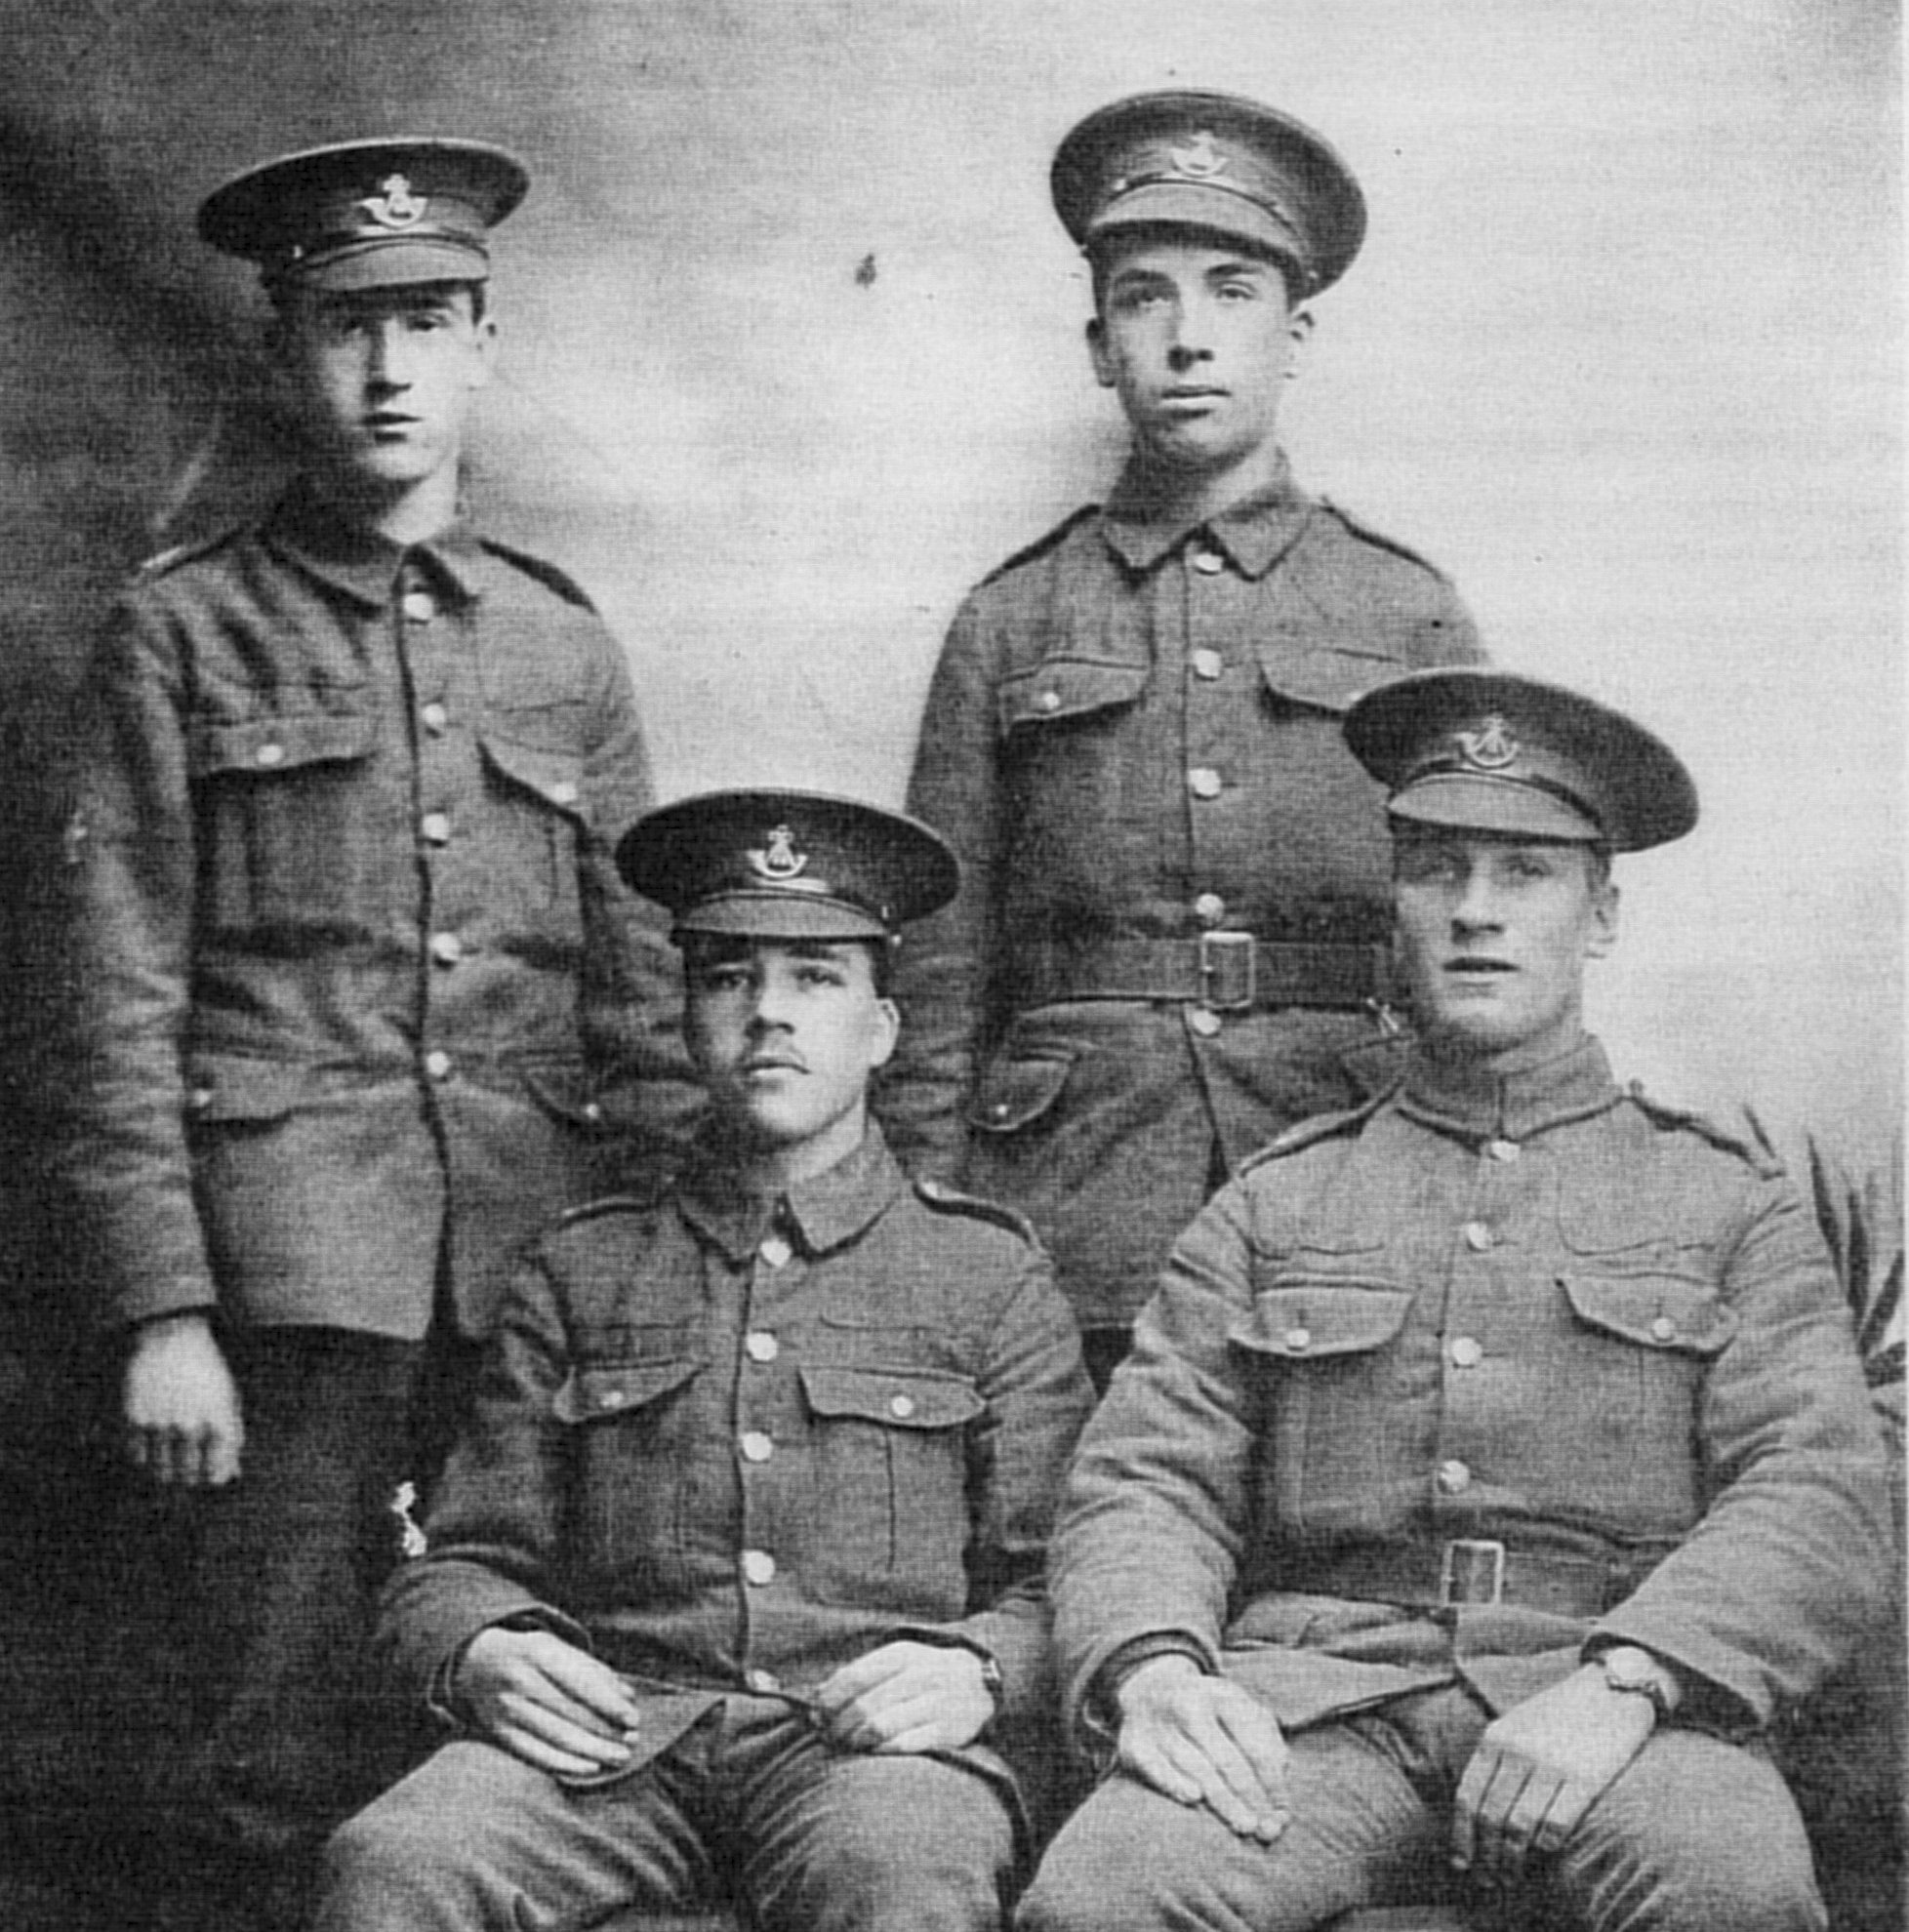 Grandpontsoldiers, 1915, courtesy of Jim Tallett